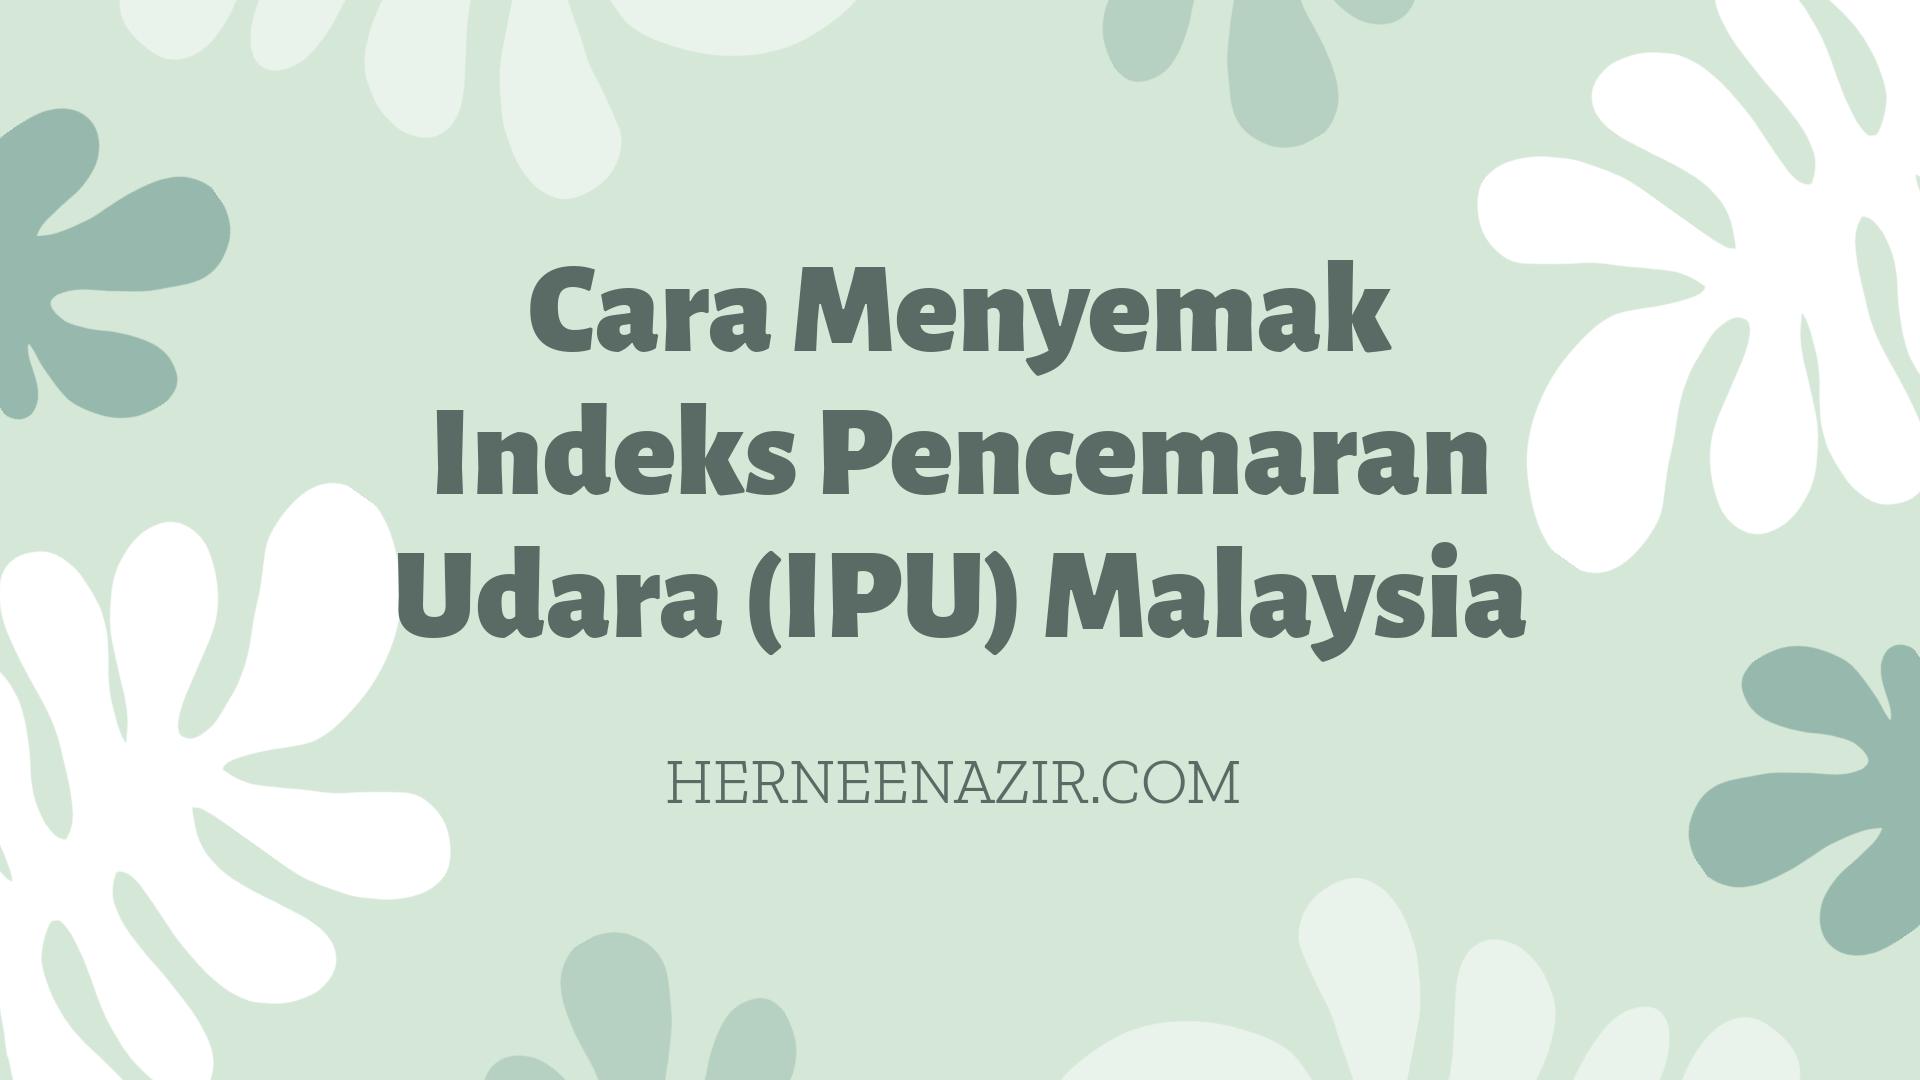 Cara Menyemak Indeks Pencemaran Udara (IPU) Malaysia